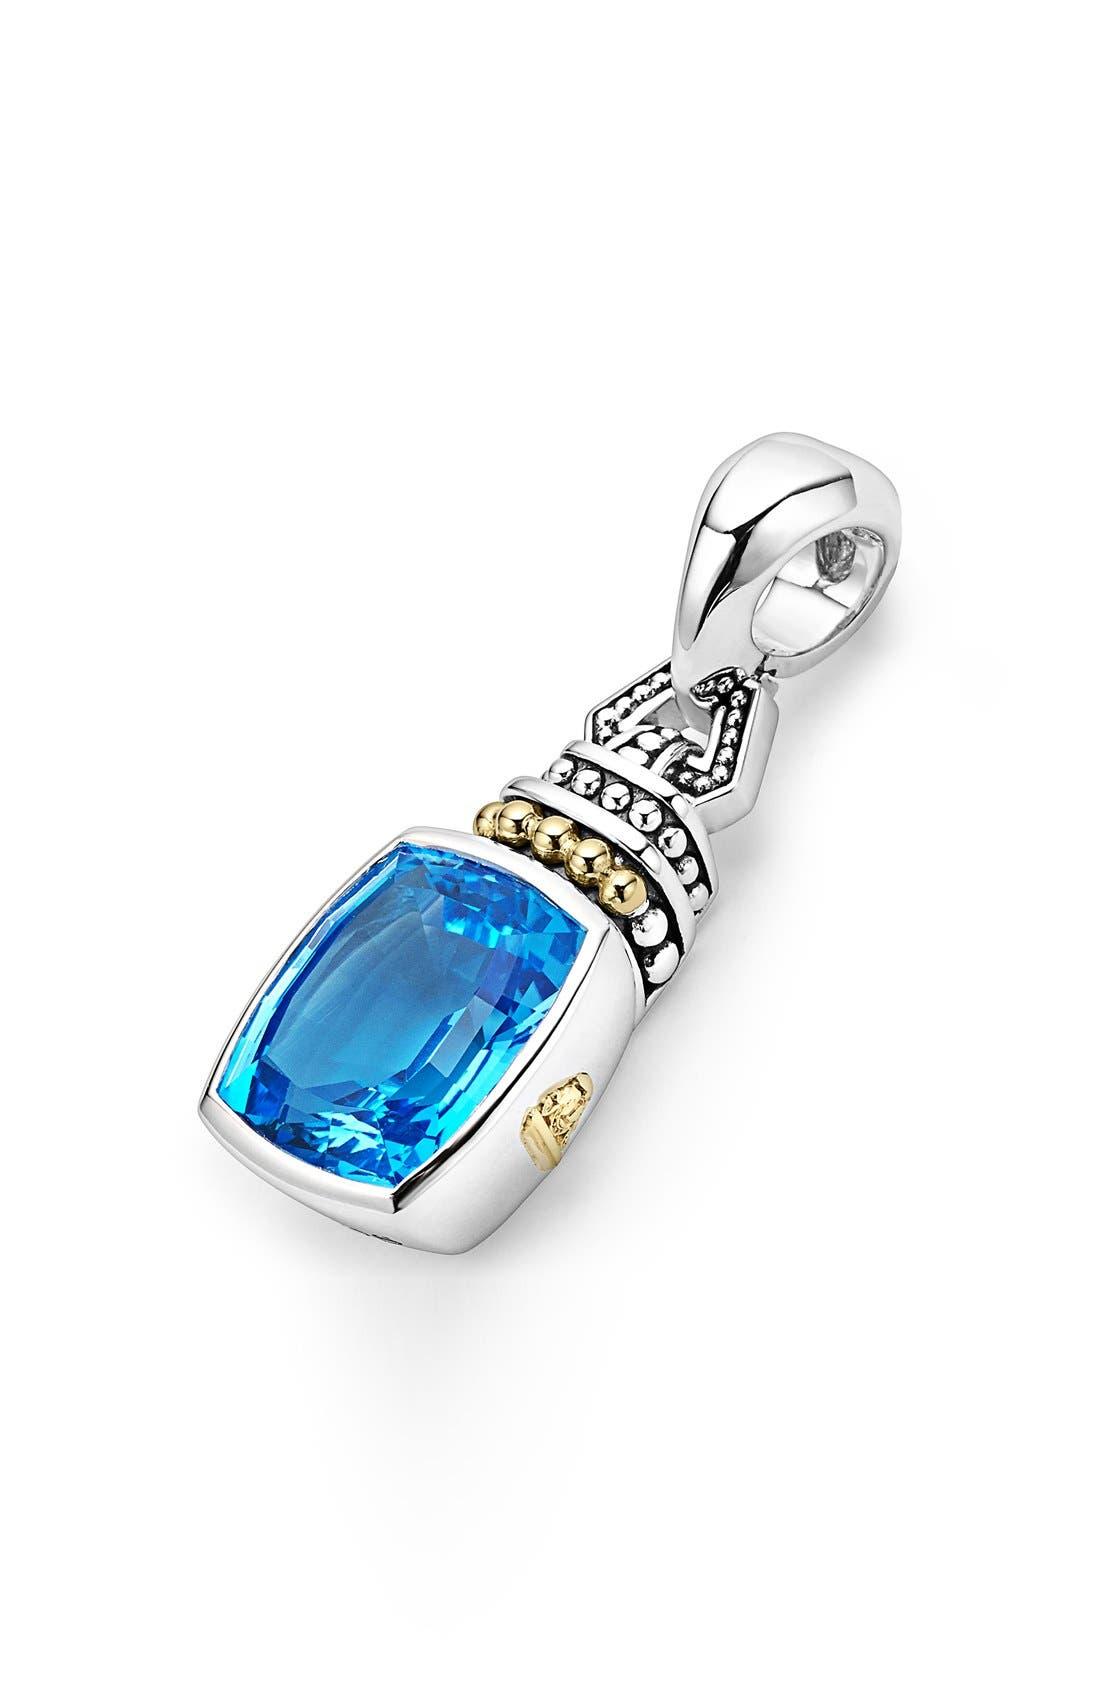 'Caviar Color' Semiprecious Stone Clip Pendant,                             Alternate thumbnail 3, color,                             BLUE TOPAZ